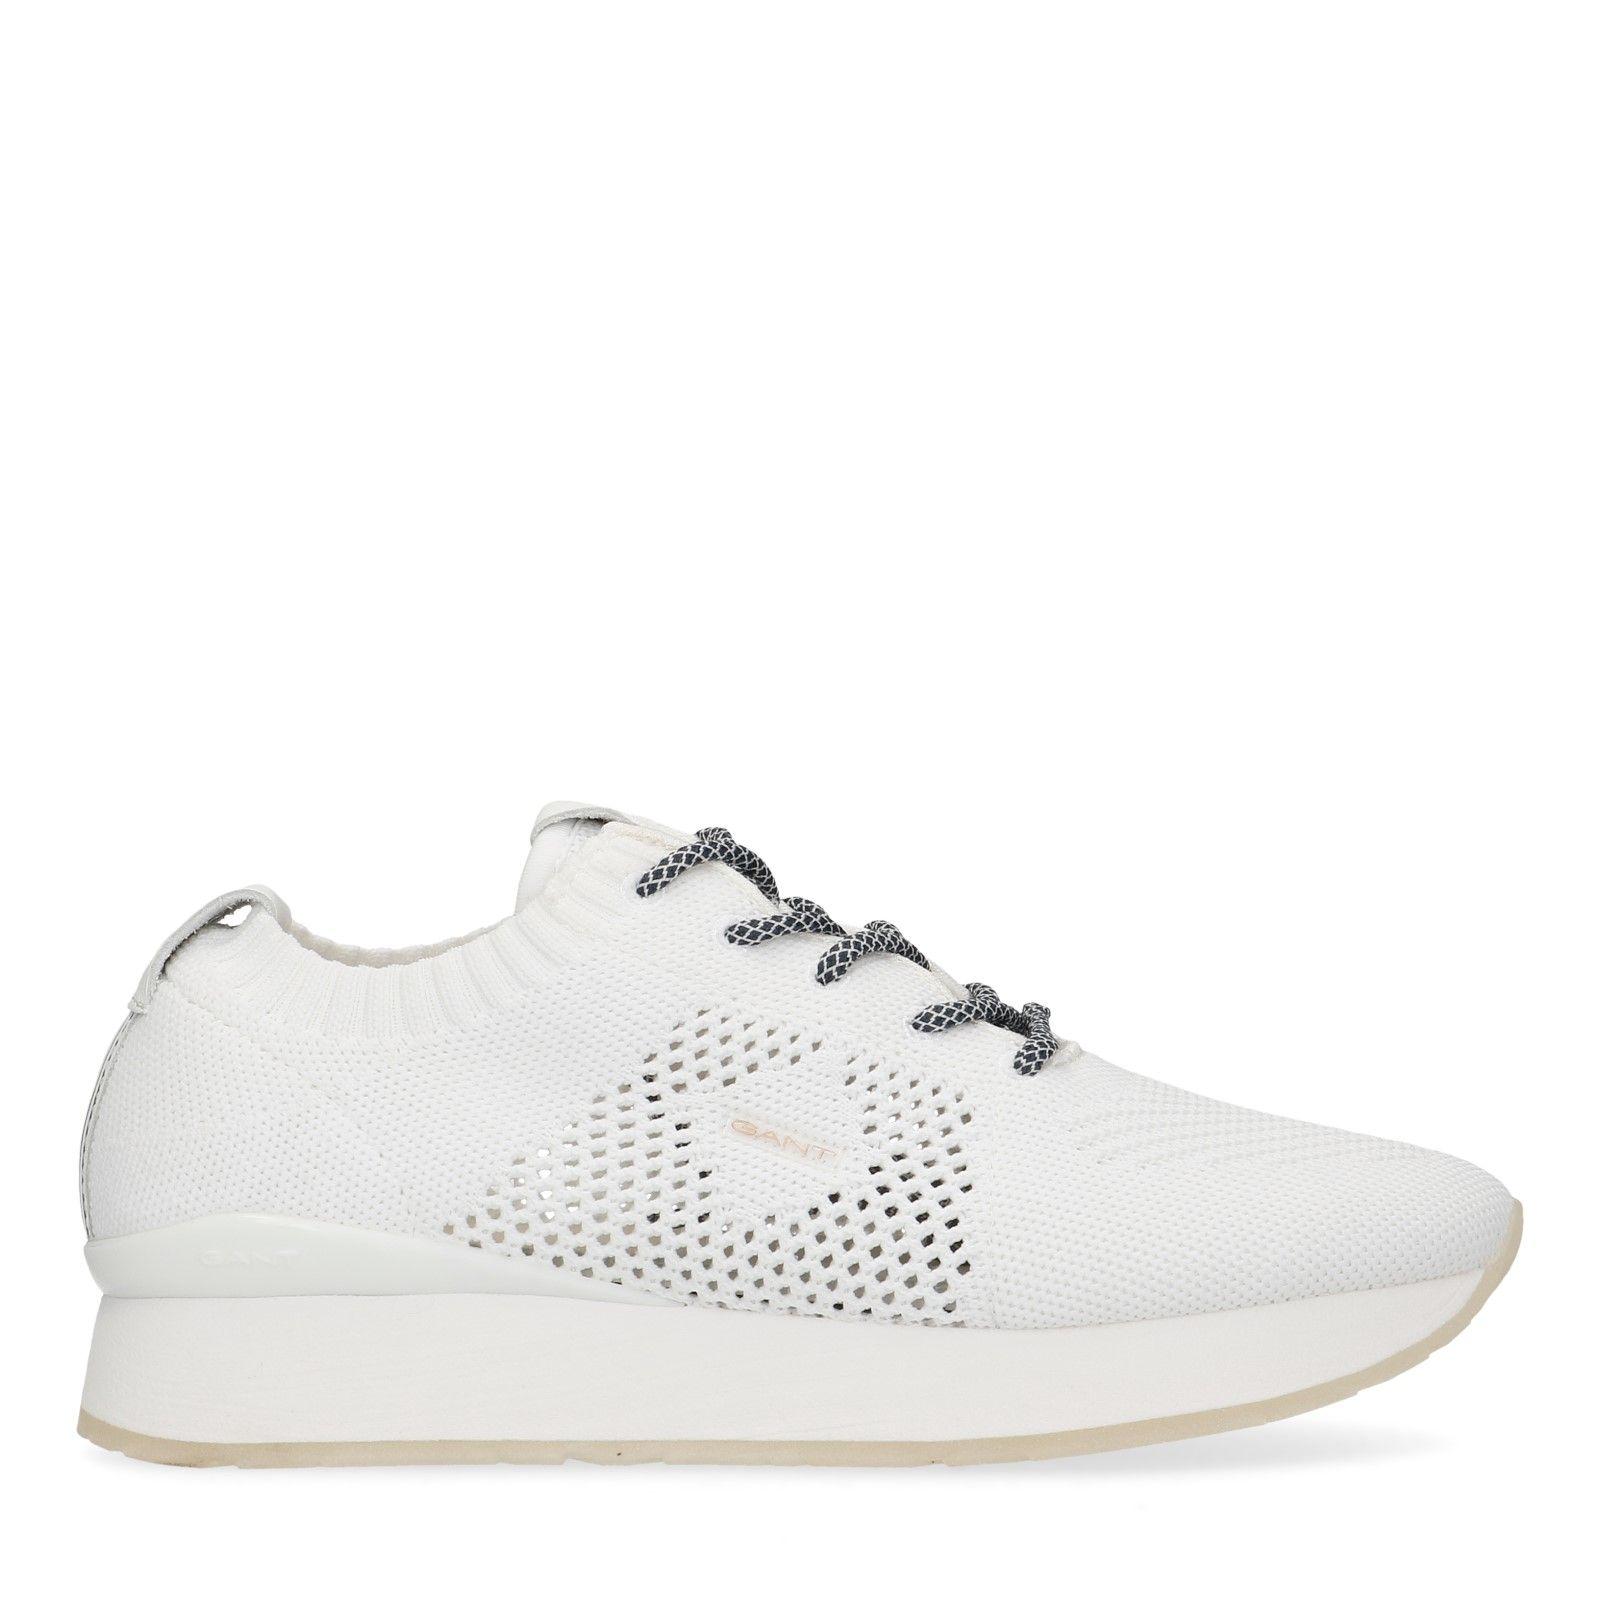 Gant GANT Bevinda witte sneakers